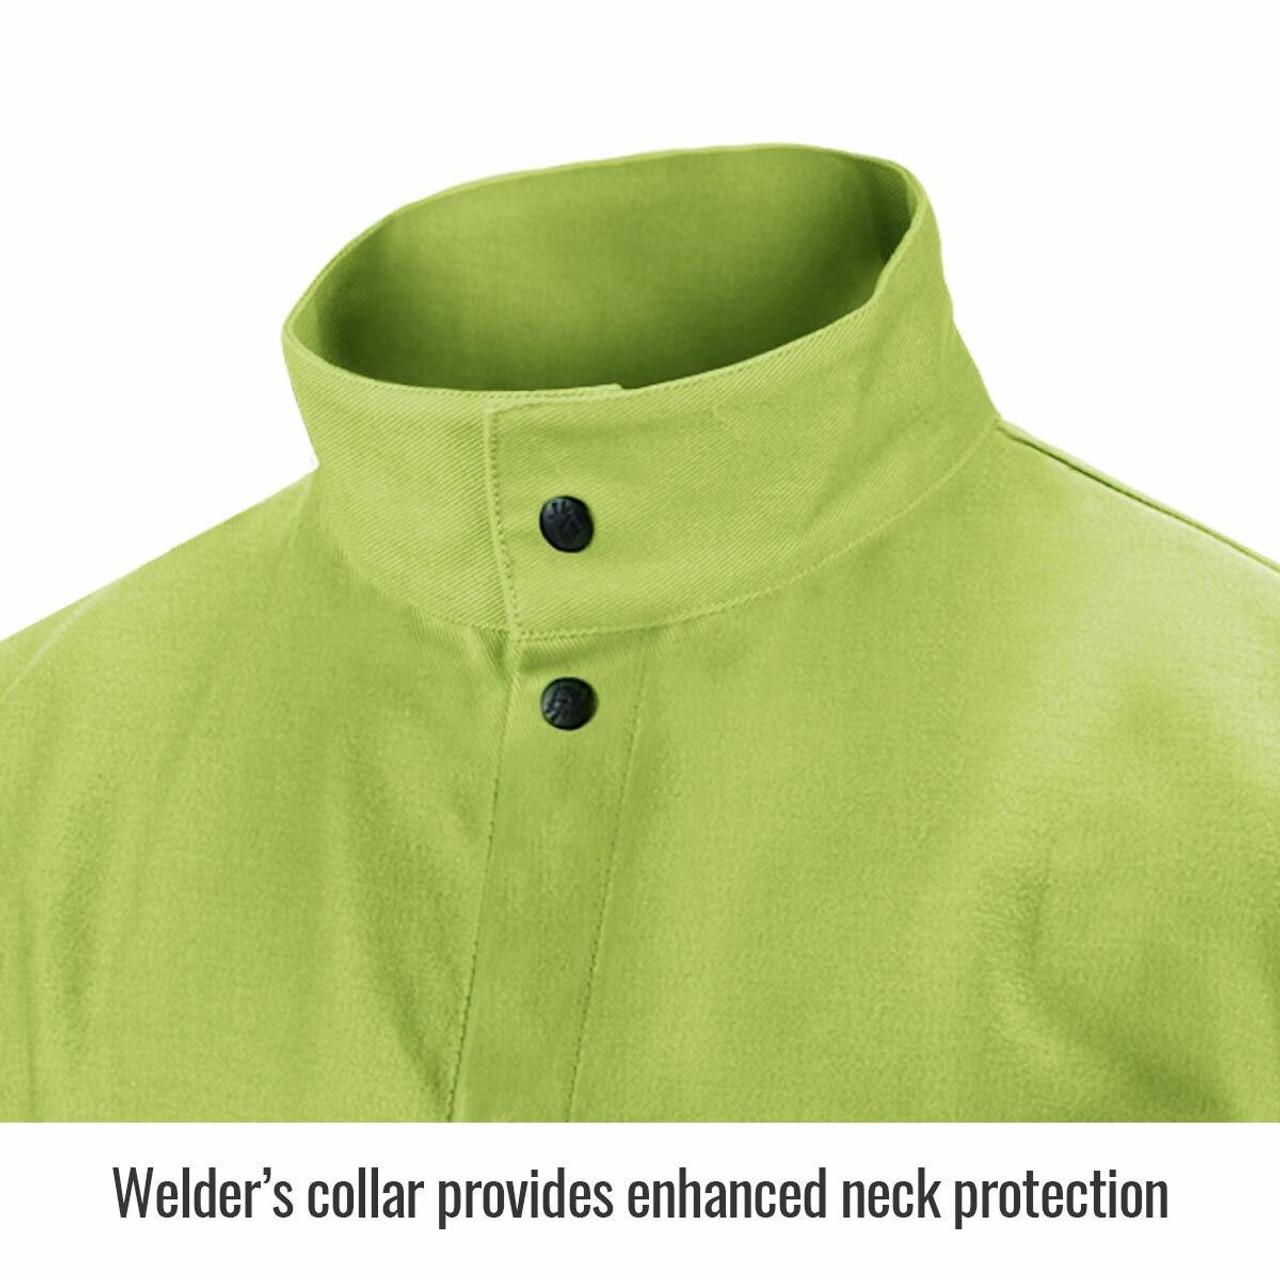 Revco FL9-30C TruGuard 200 FR Cotton Welding Jacket Safety Lime